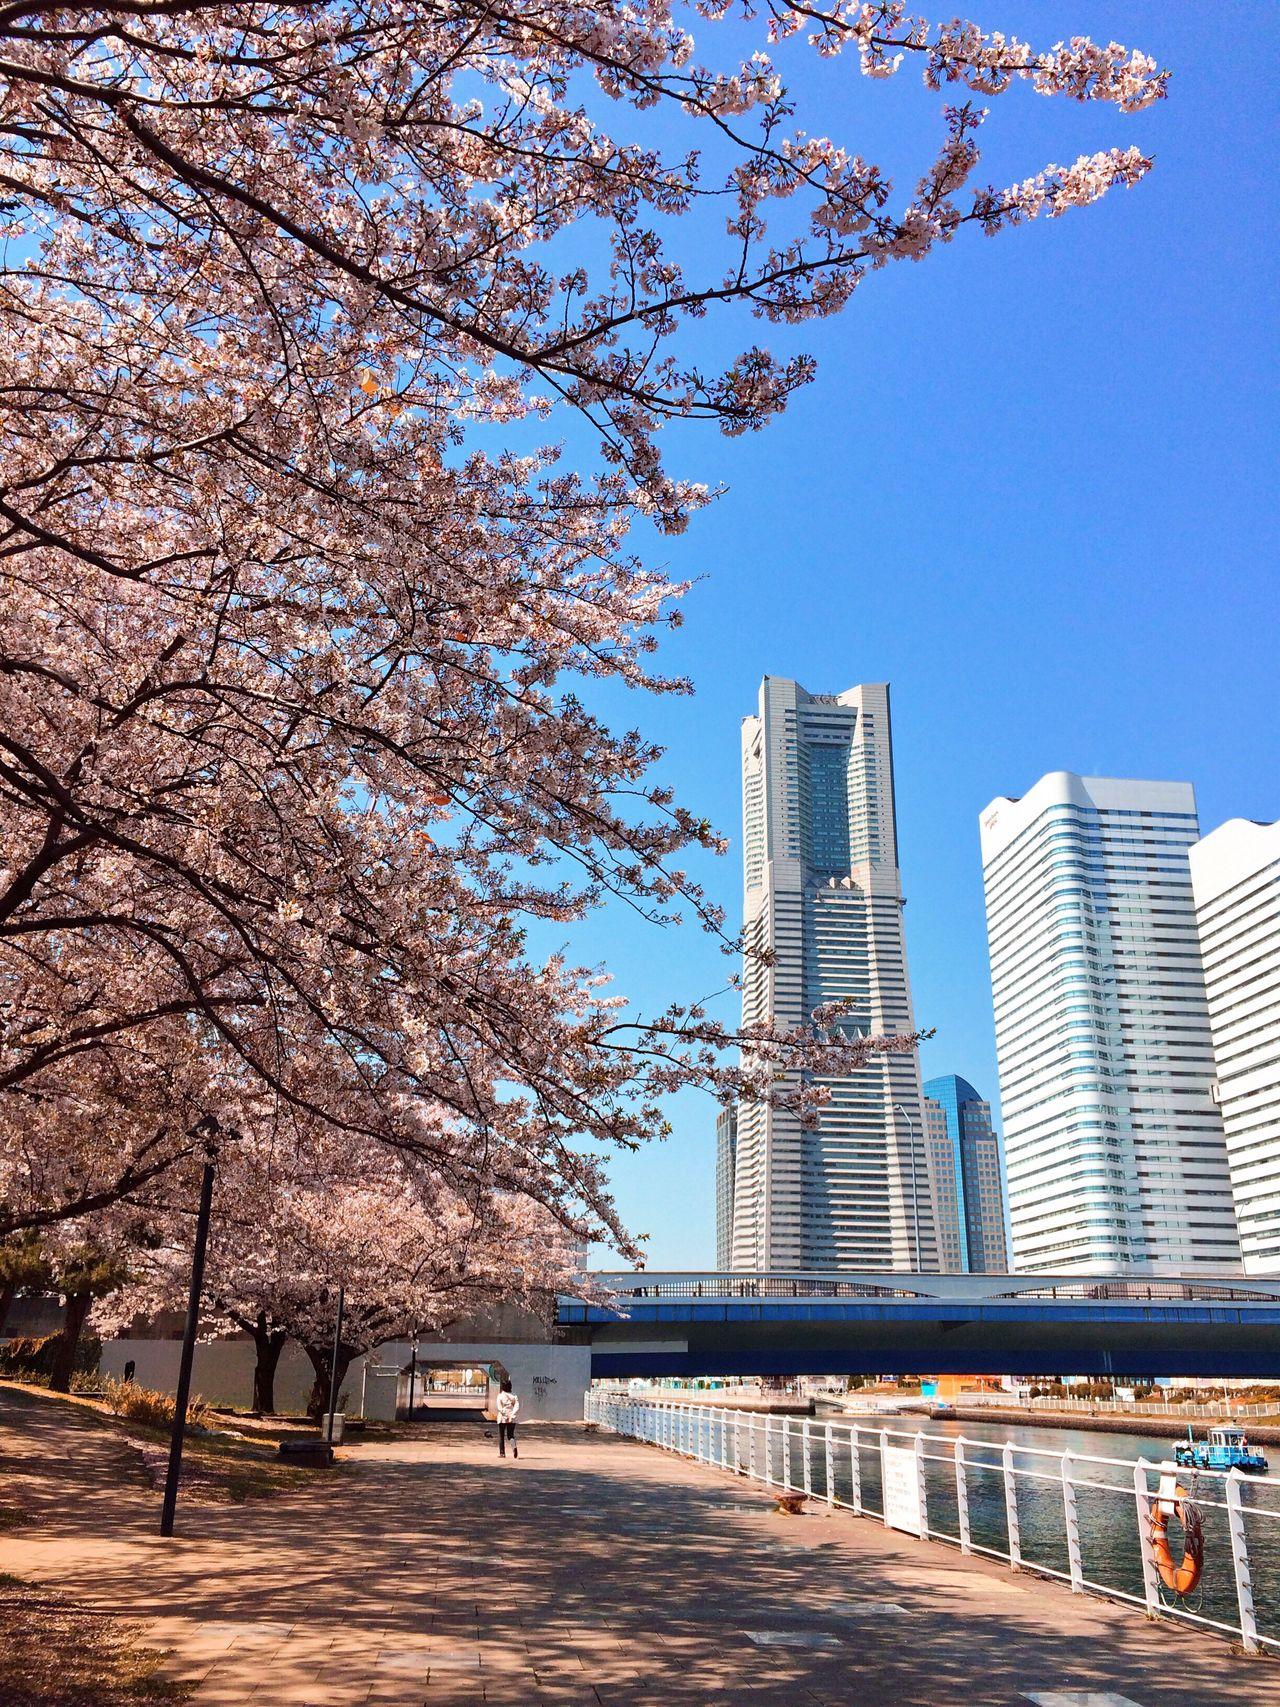 Sakura Cherry Blossoms Building Tree Springtime Outdoors 桜 春 建物 写真好きな人と繋がりたい 写真撮ってる人と繋がりたい ランドマークタワー 横浜ランドマークタワー in Yokohama-shi , Japan The Street Photographer